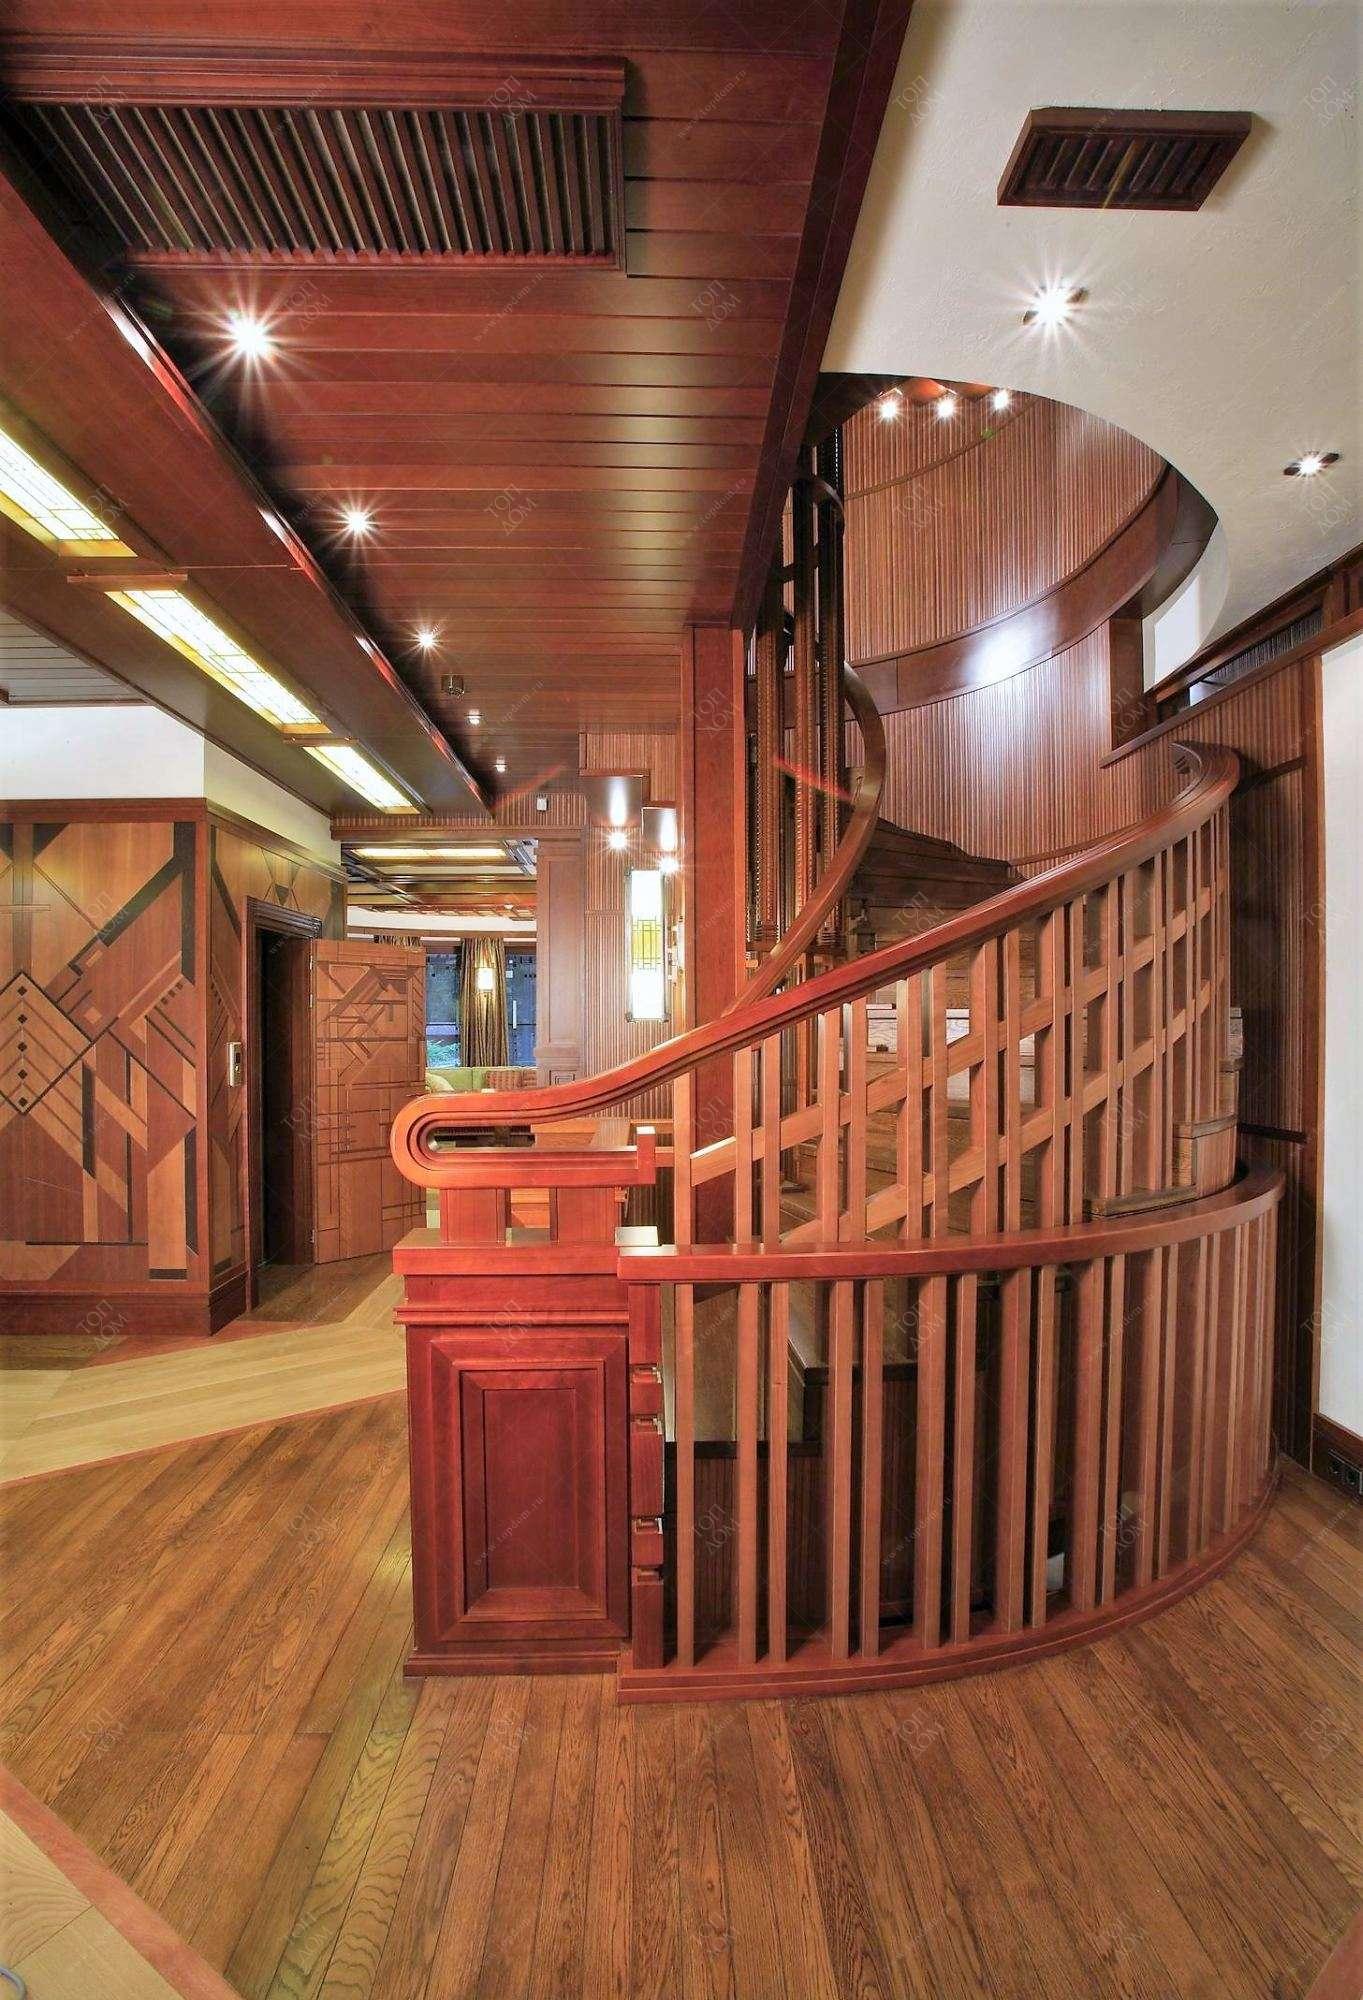 http://www.topdom.ru/gallery/cottage/4/9.jpg